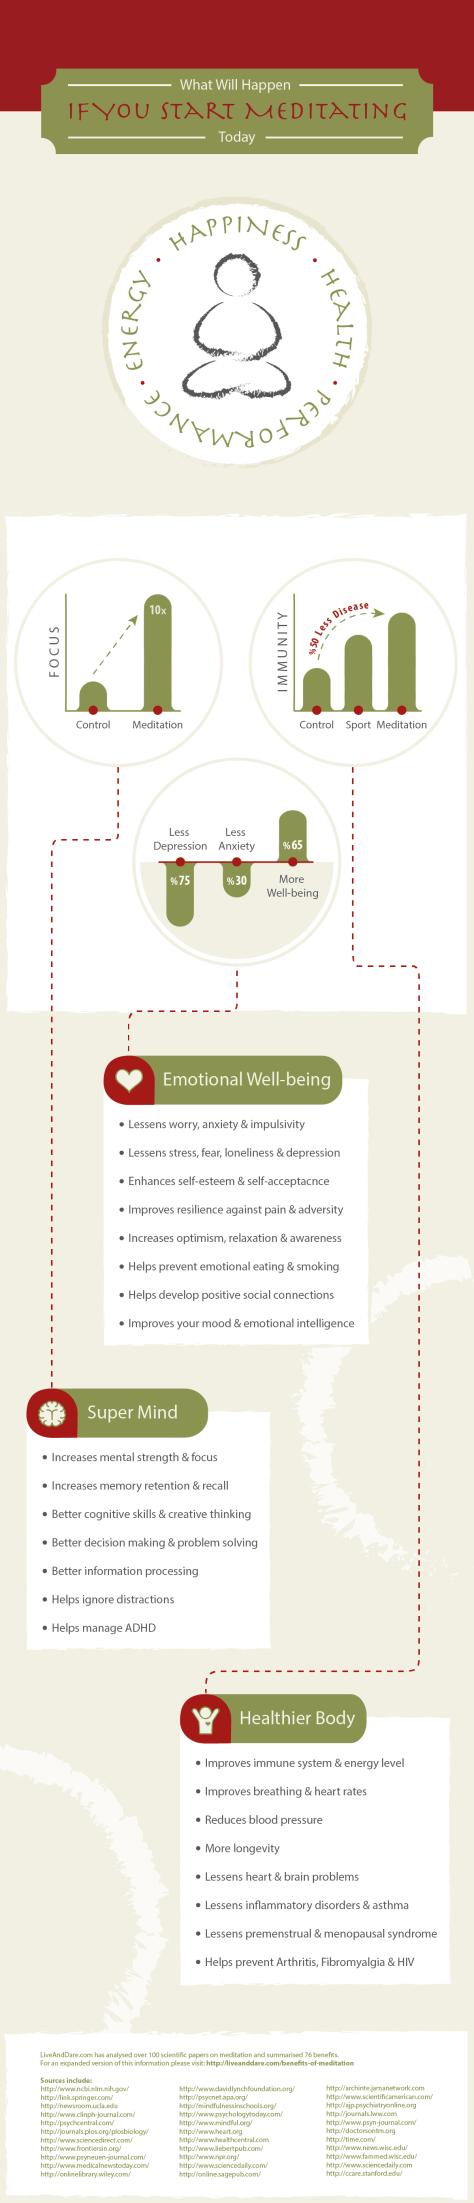 Benefits-of-Meditation-Infographic